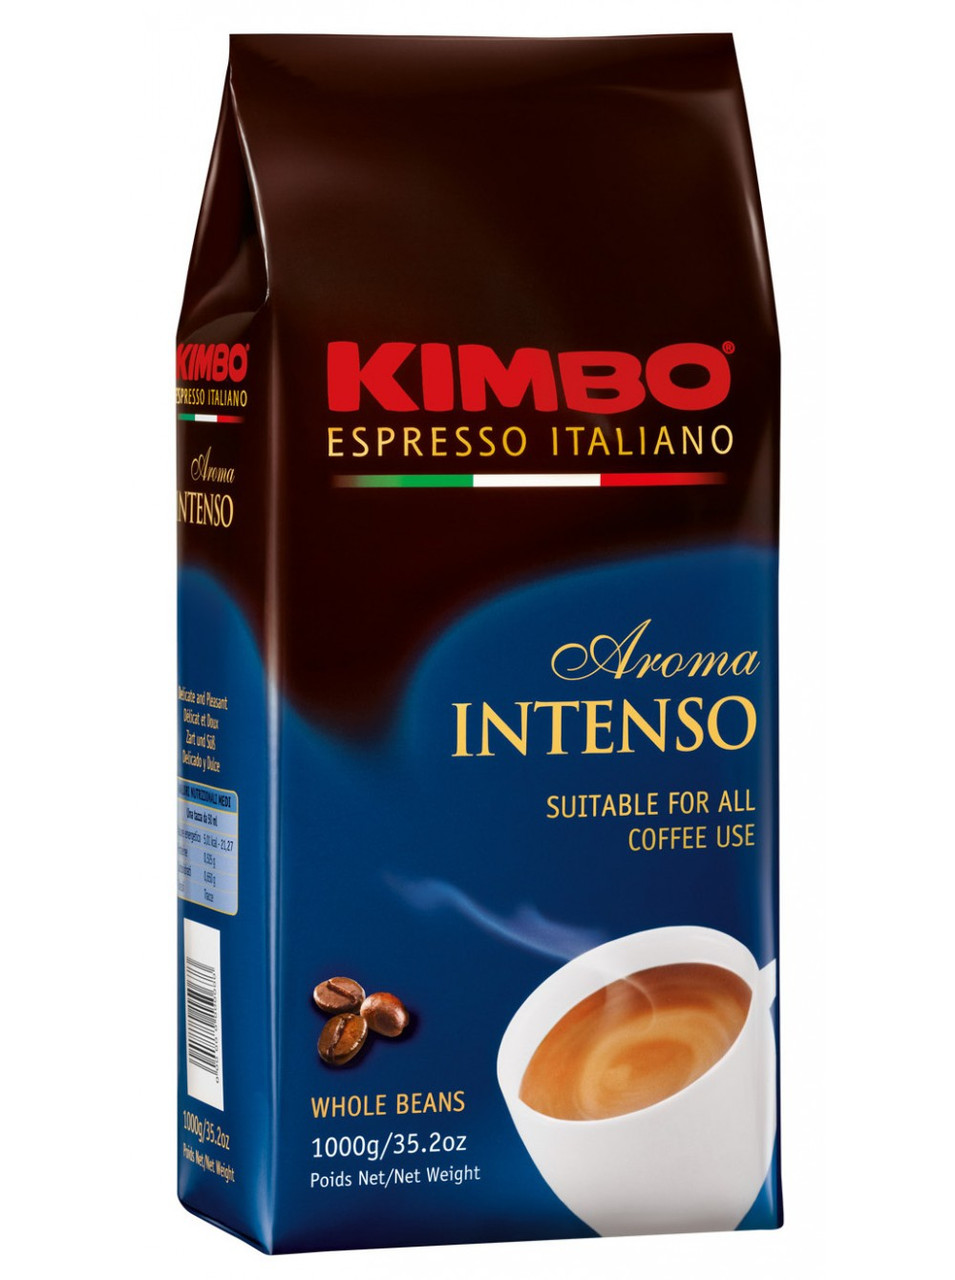 Кофе в зернах KIMBO AROMA INTENSO, 1кг.  Италия